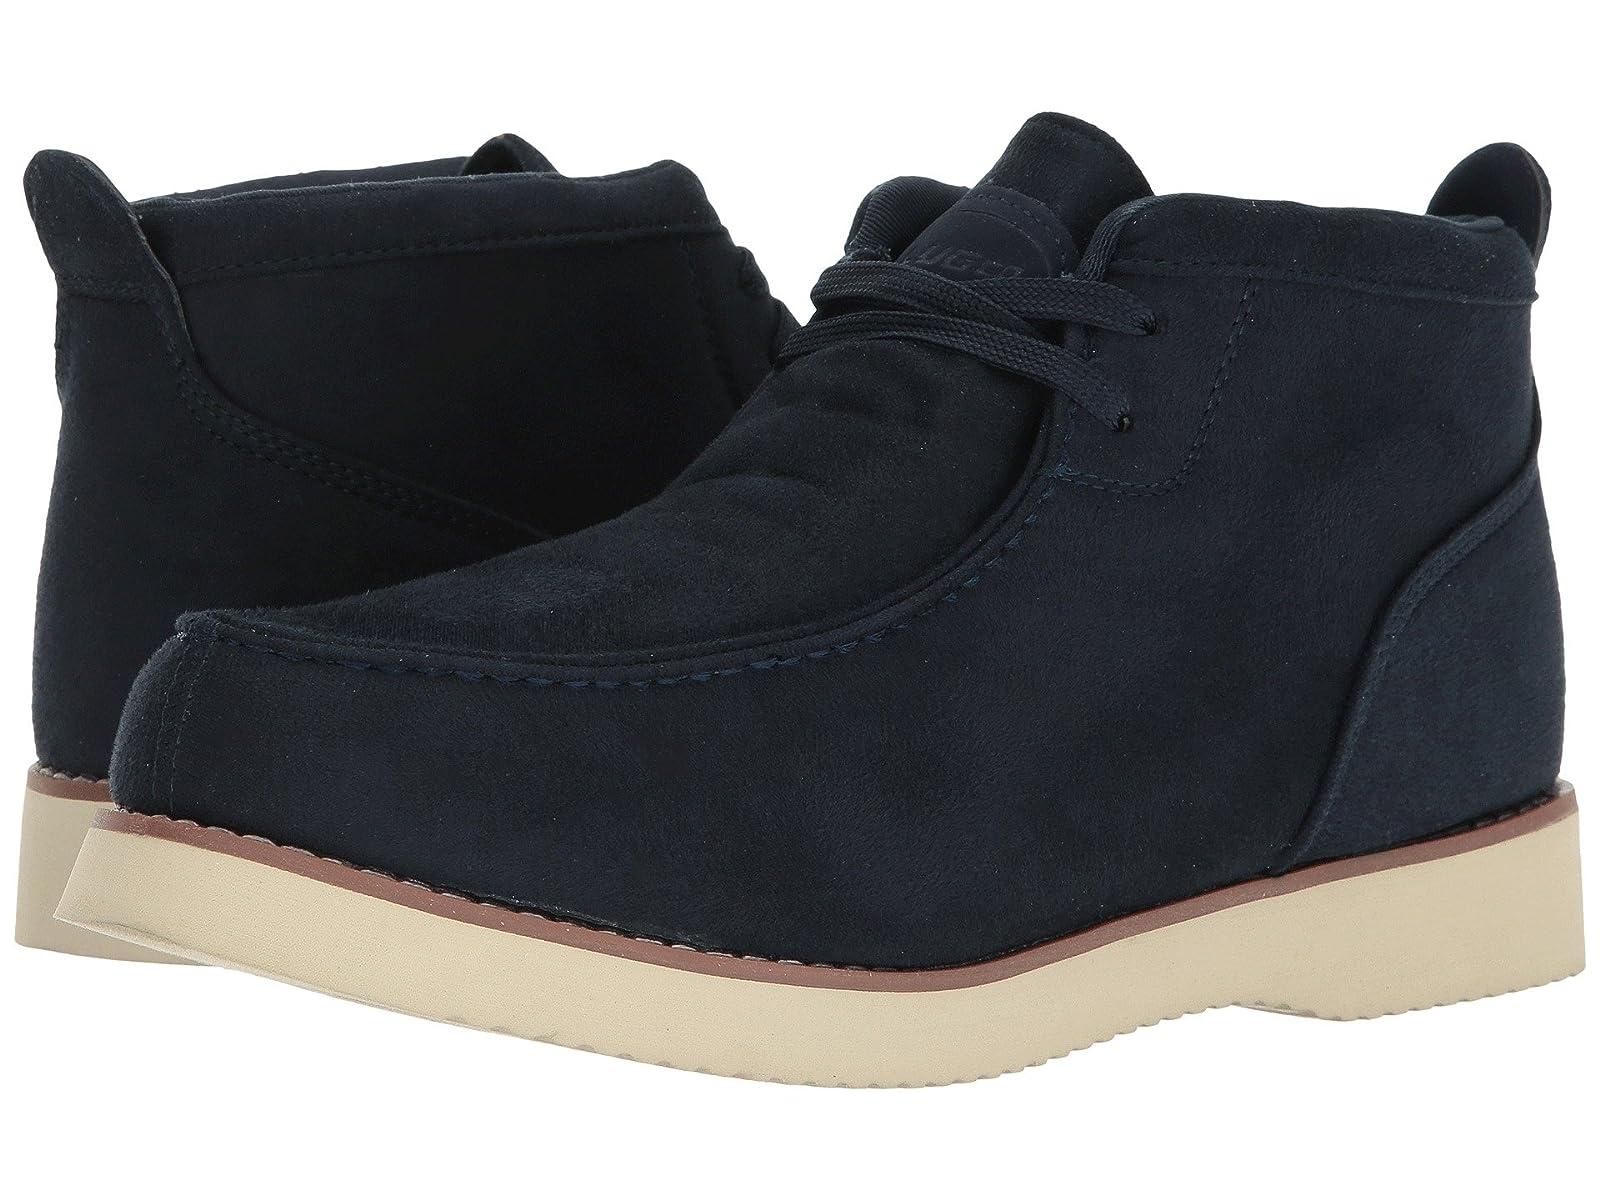 Lugz FreemanCheap and distinctive eye-catching shoes